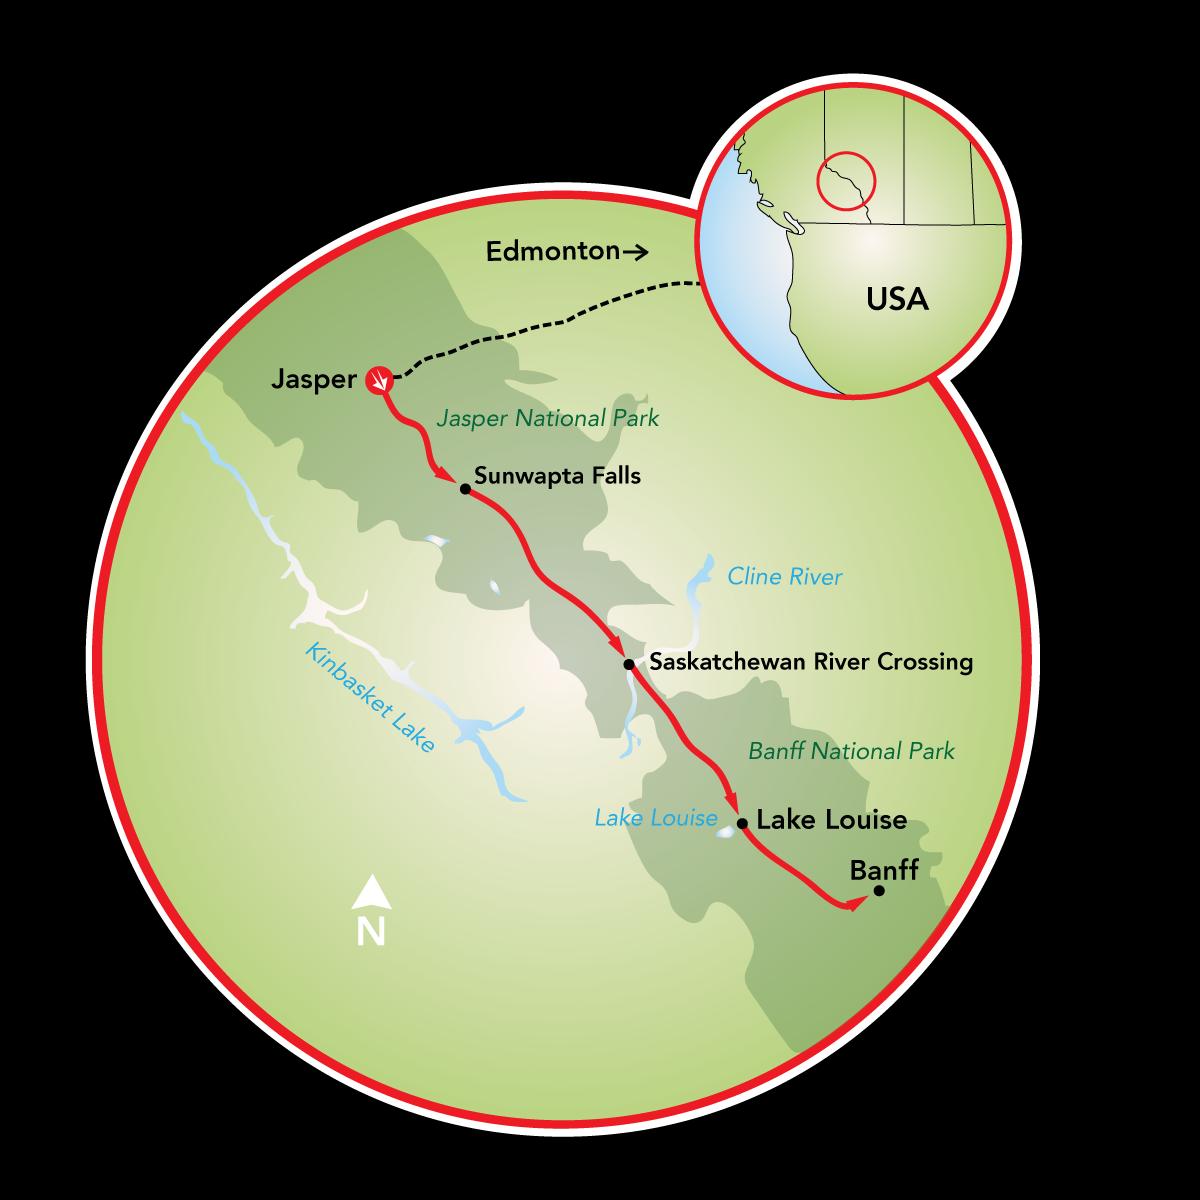 Banff Tour Guide Service